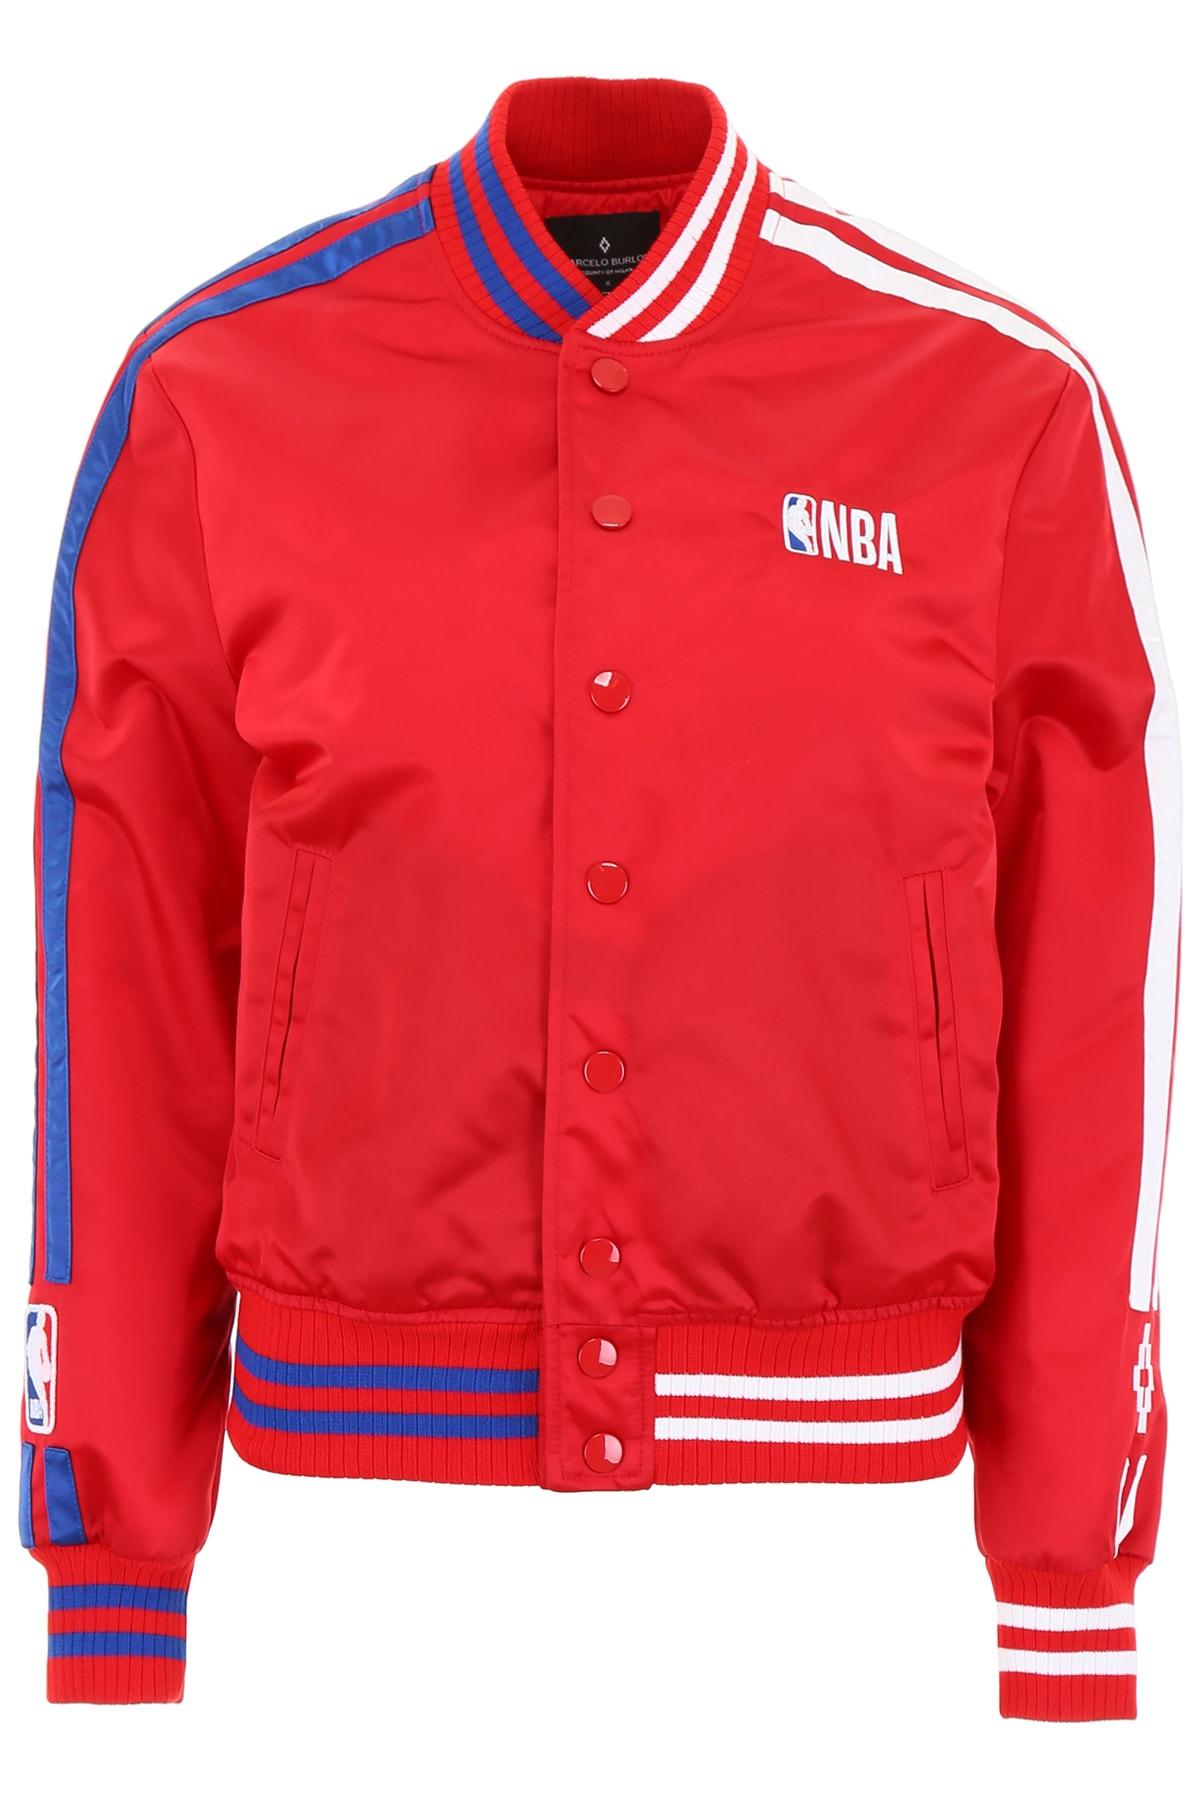 Marcelo Burlon Nba Bomber Jacket